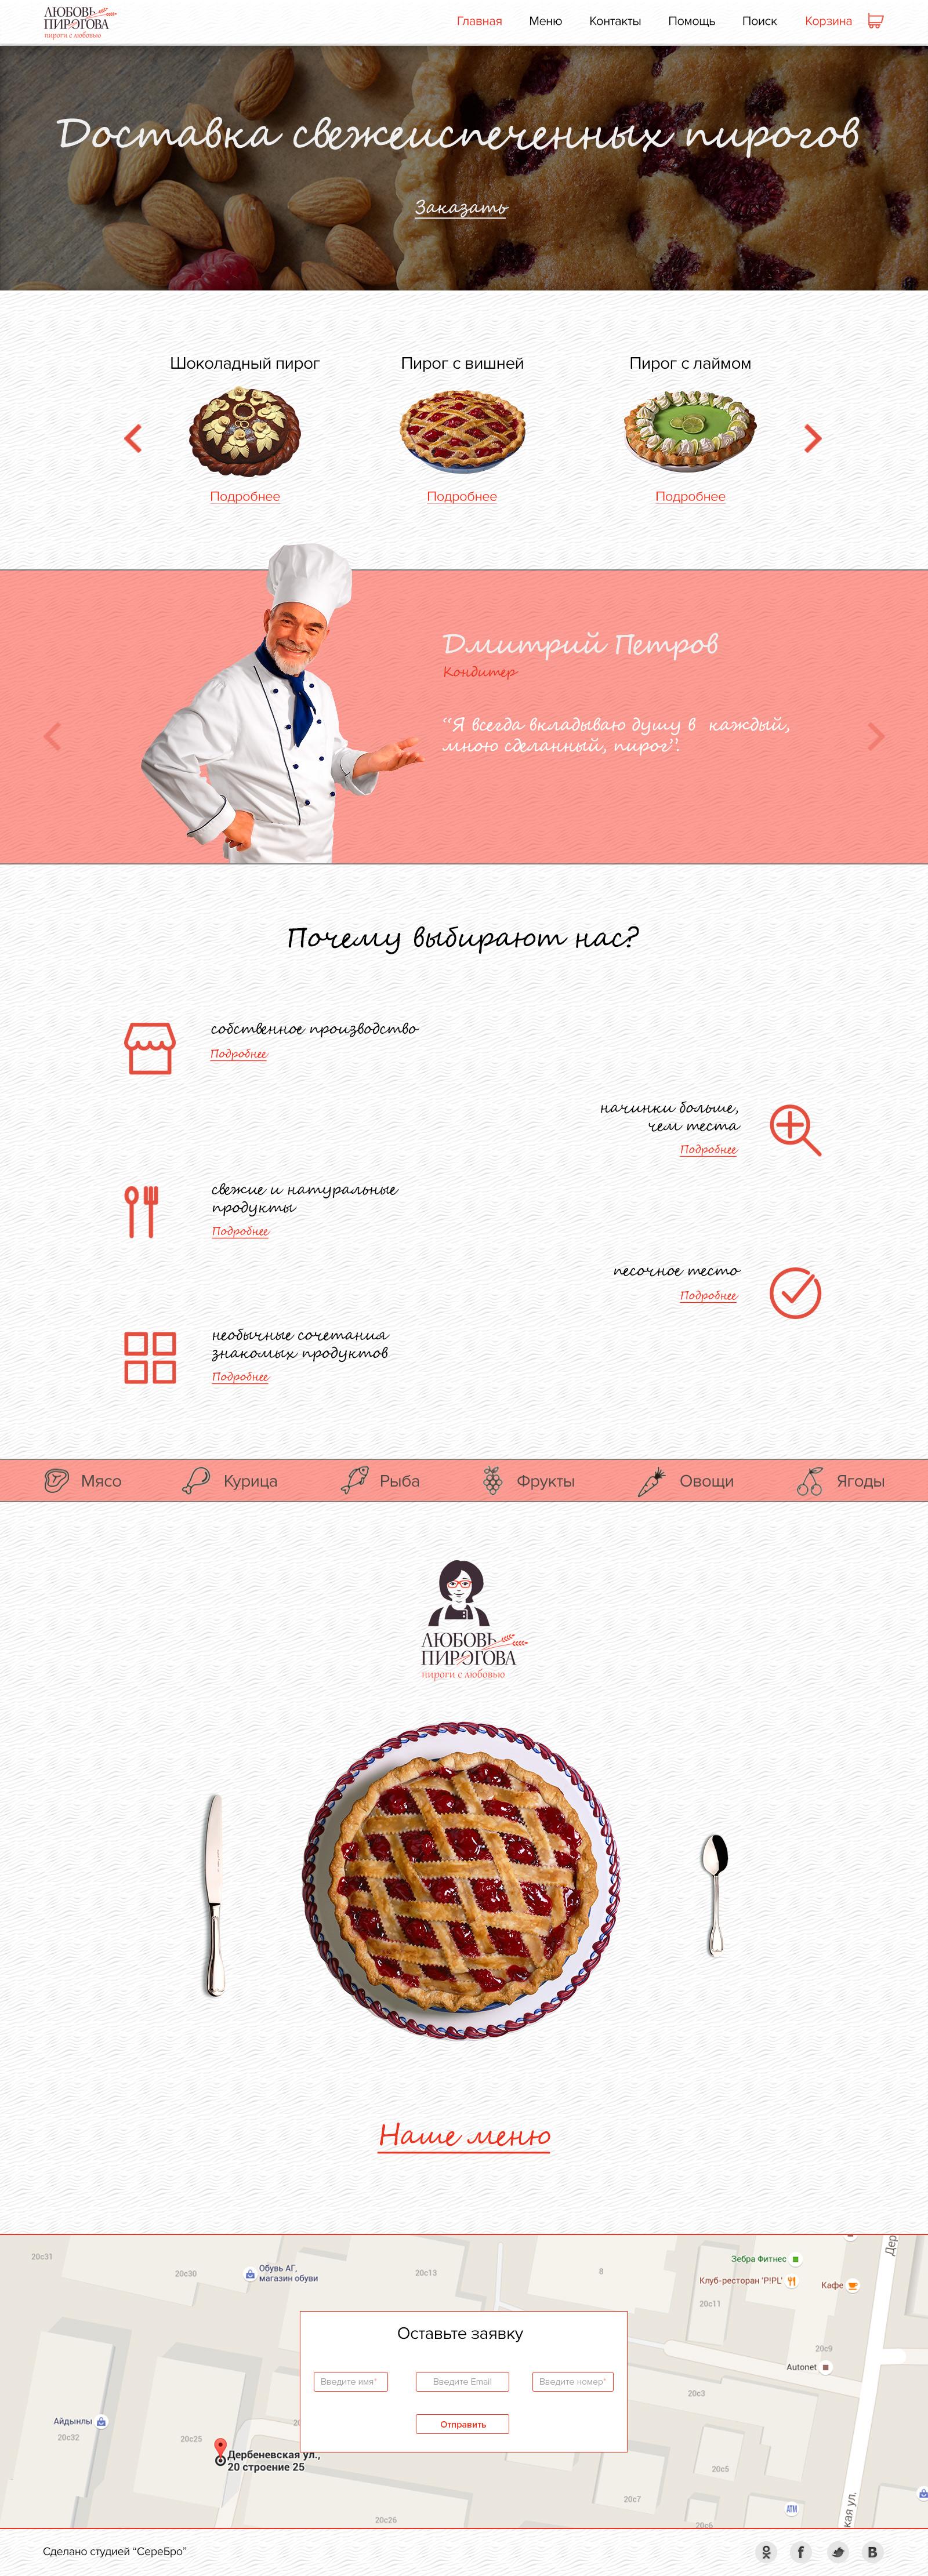 Разработка дизайна сайта lovepirogova.ru фото f_87756b73eac83973.jpg